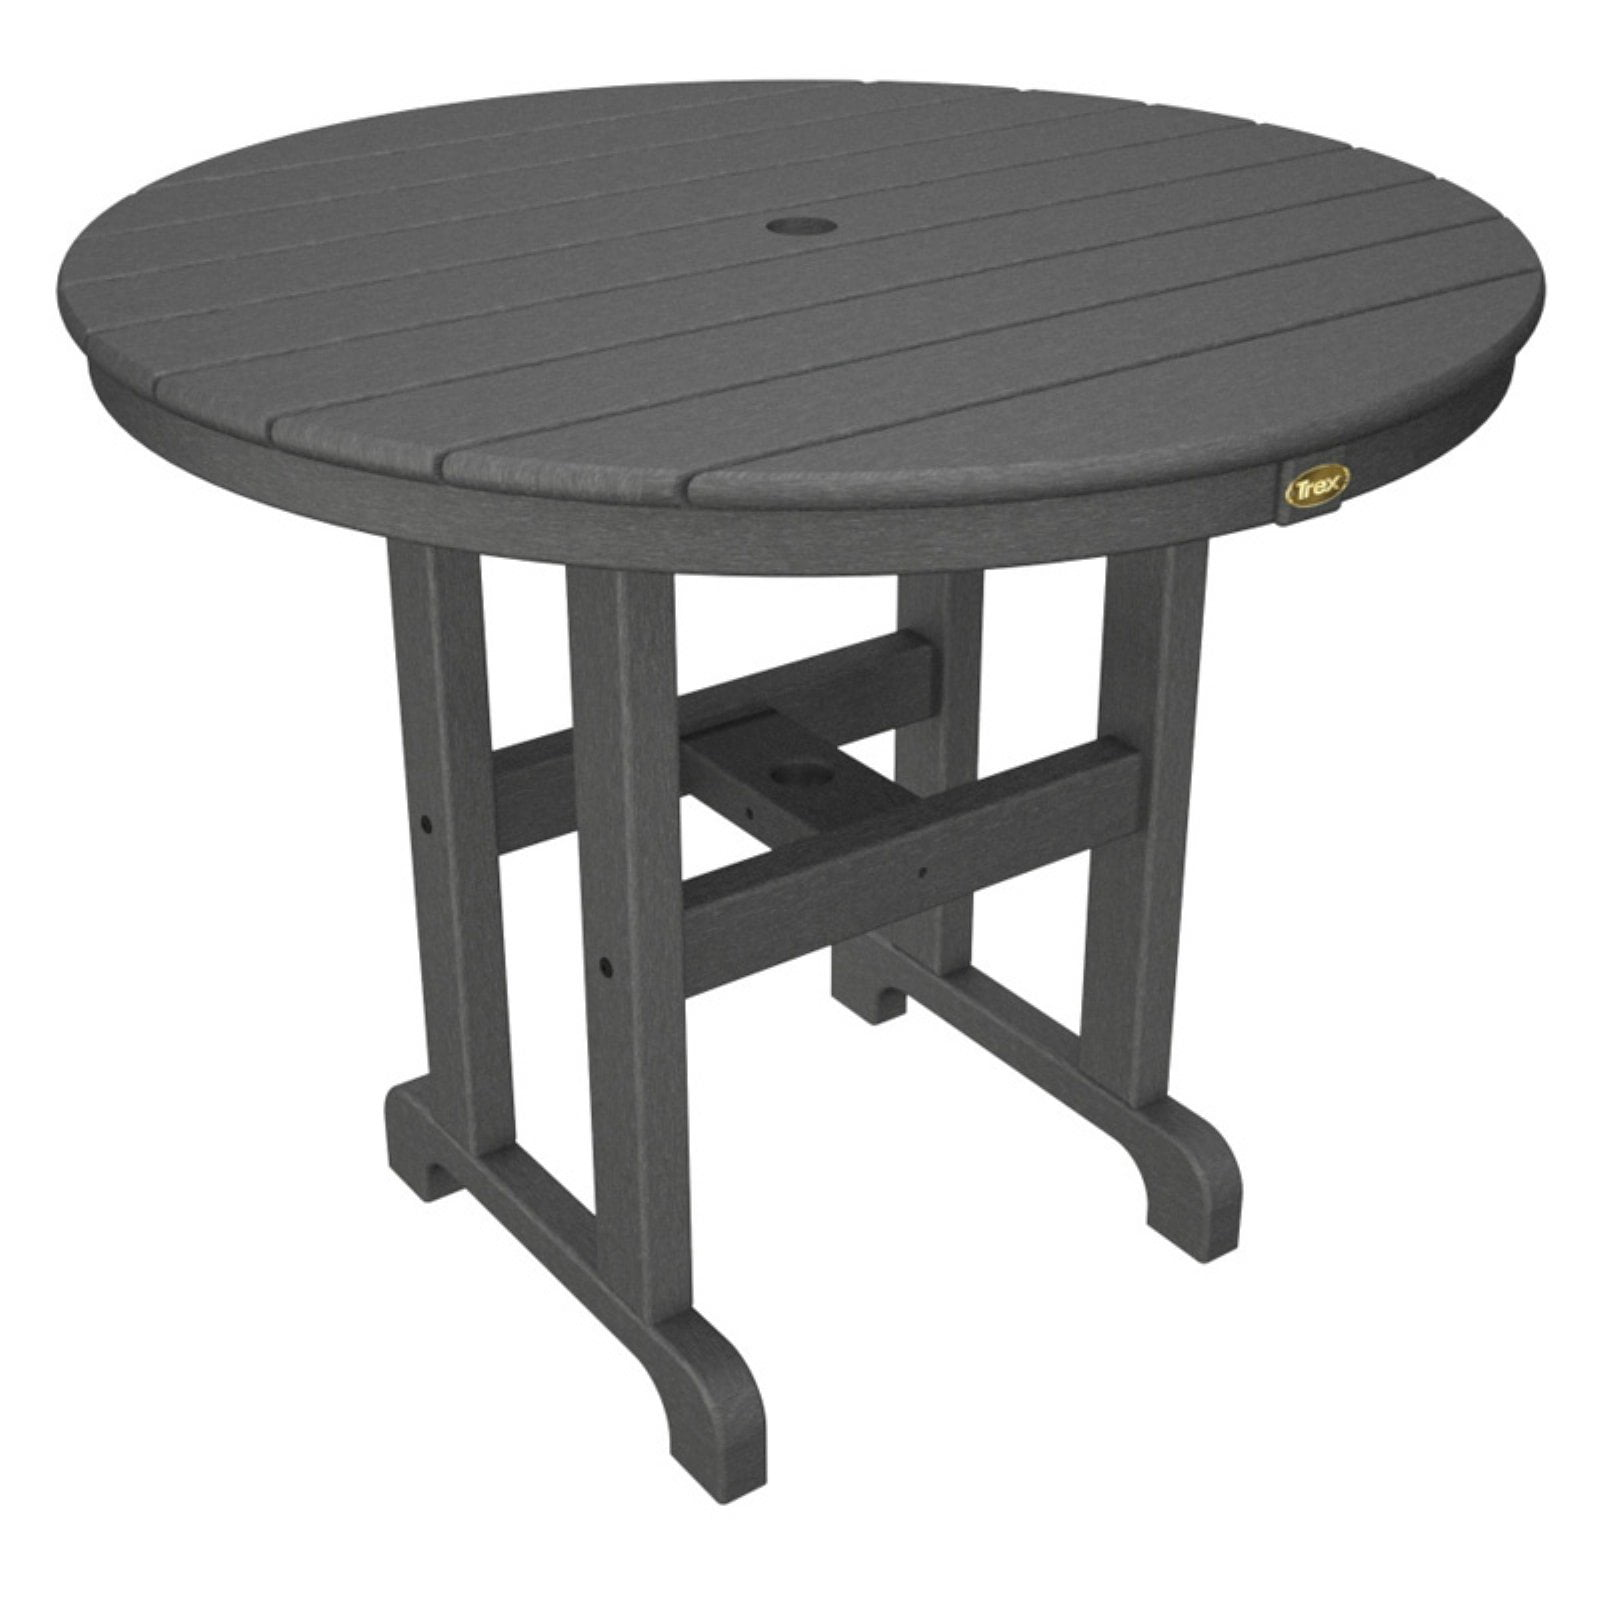 Trex Outdoor Furniture Recycled Plastic Monterey Bay Round Patio Dining Table Walmart Com Walmart Com